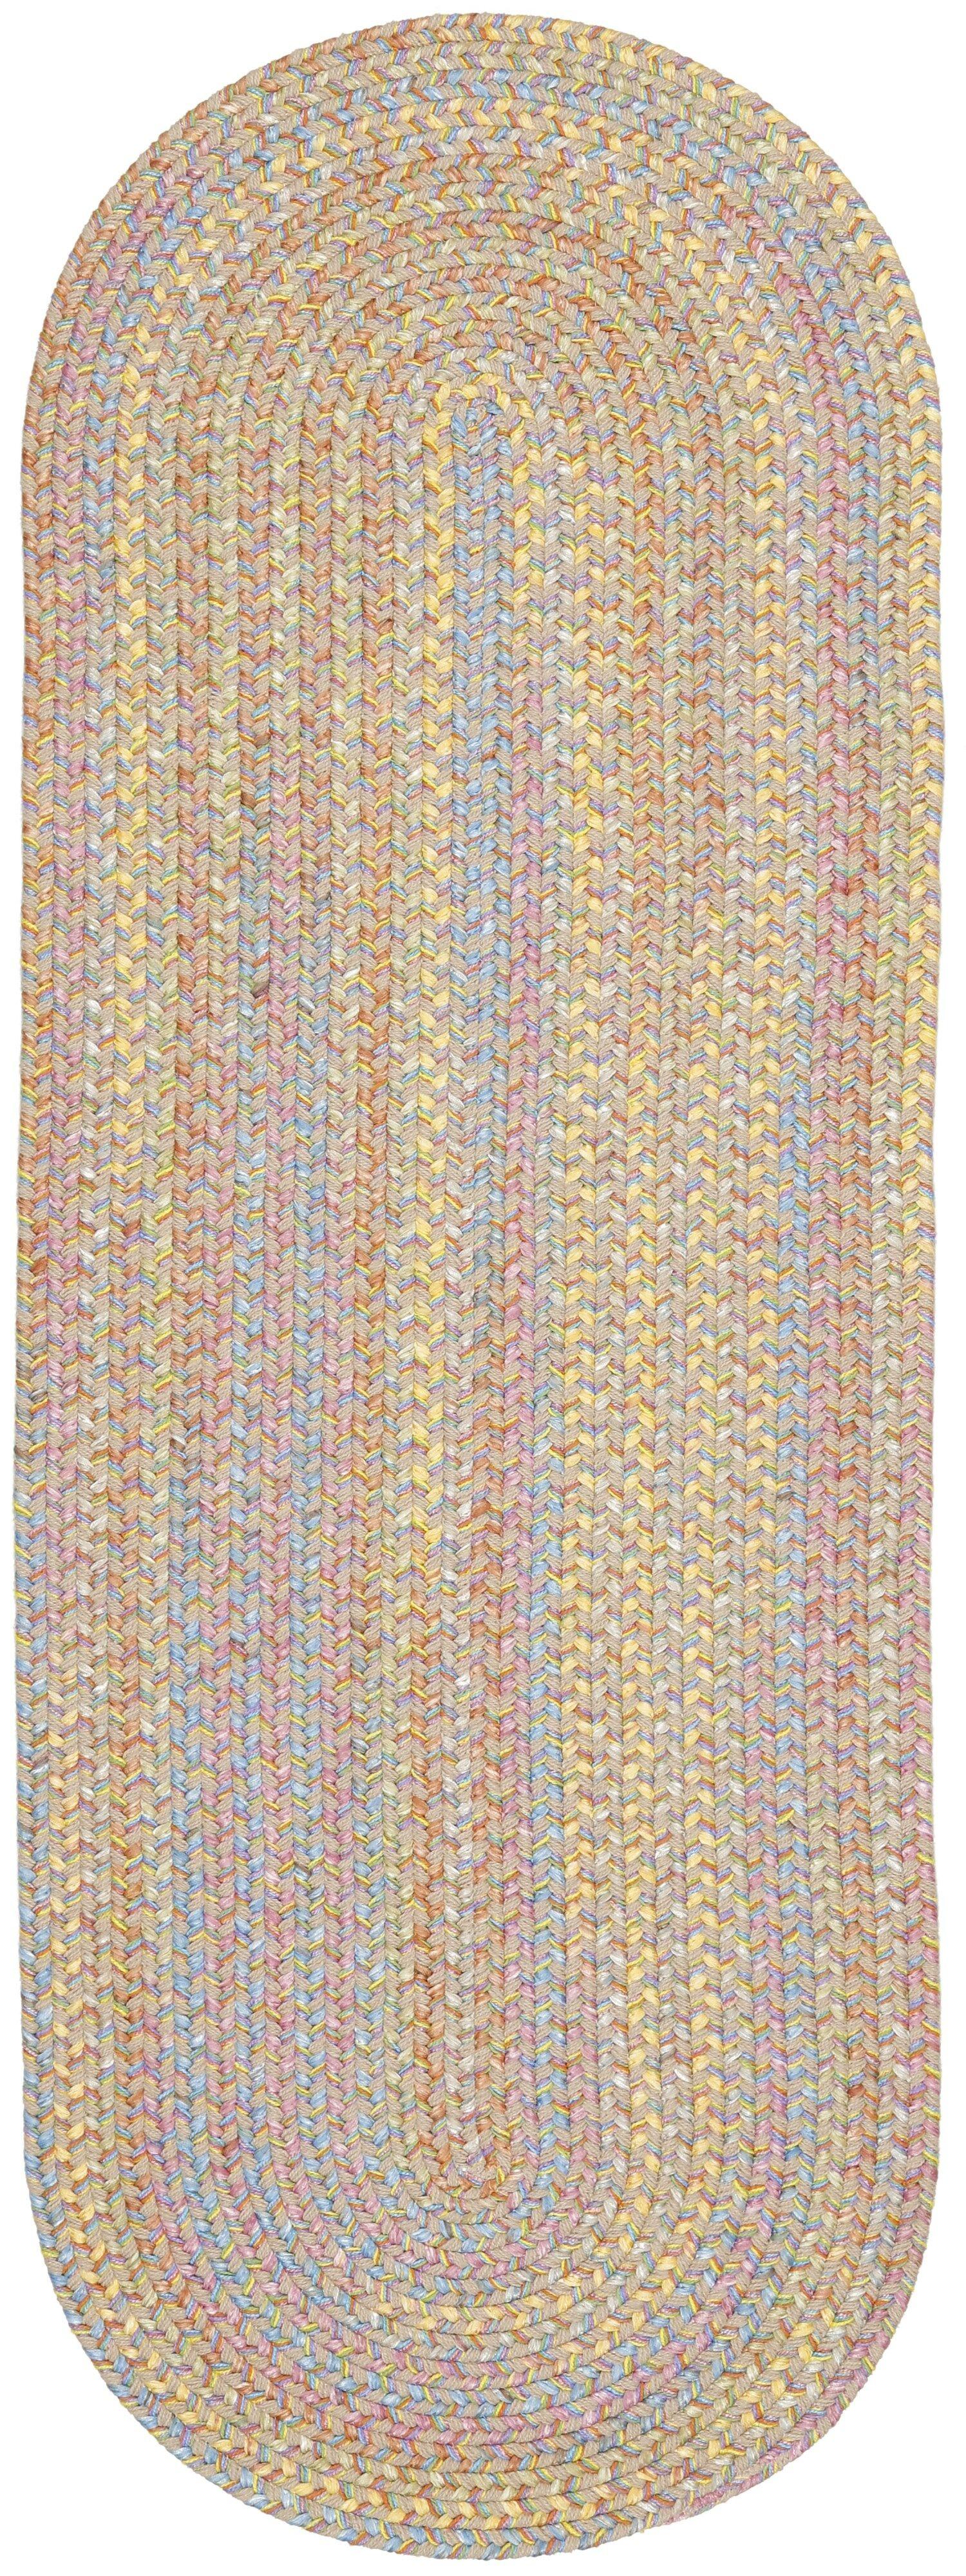 Safidon Beige Indoor/Outdoor Area Rug Rug Size: Oval 2' x 8'